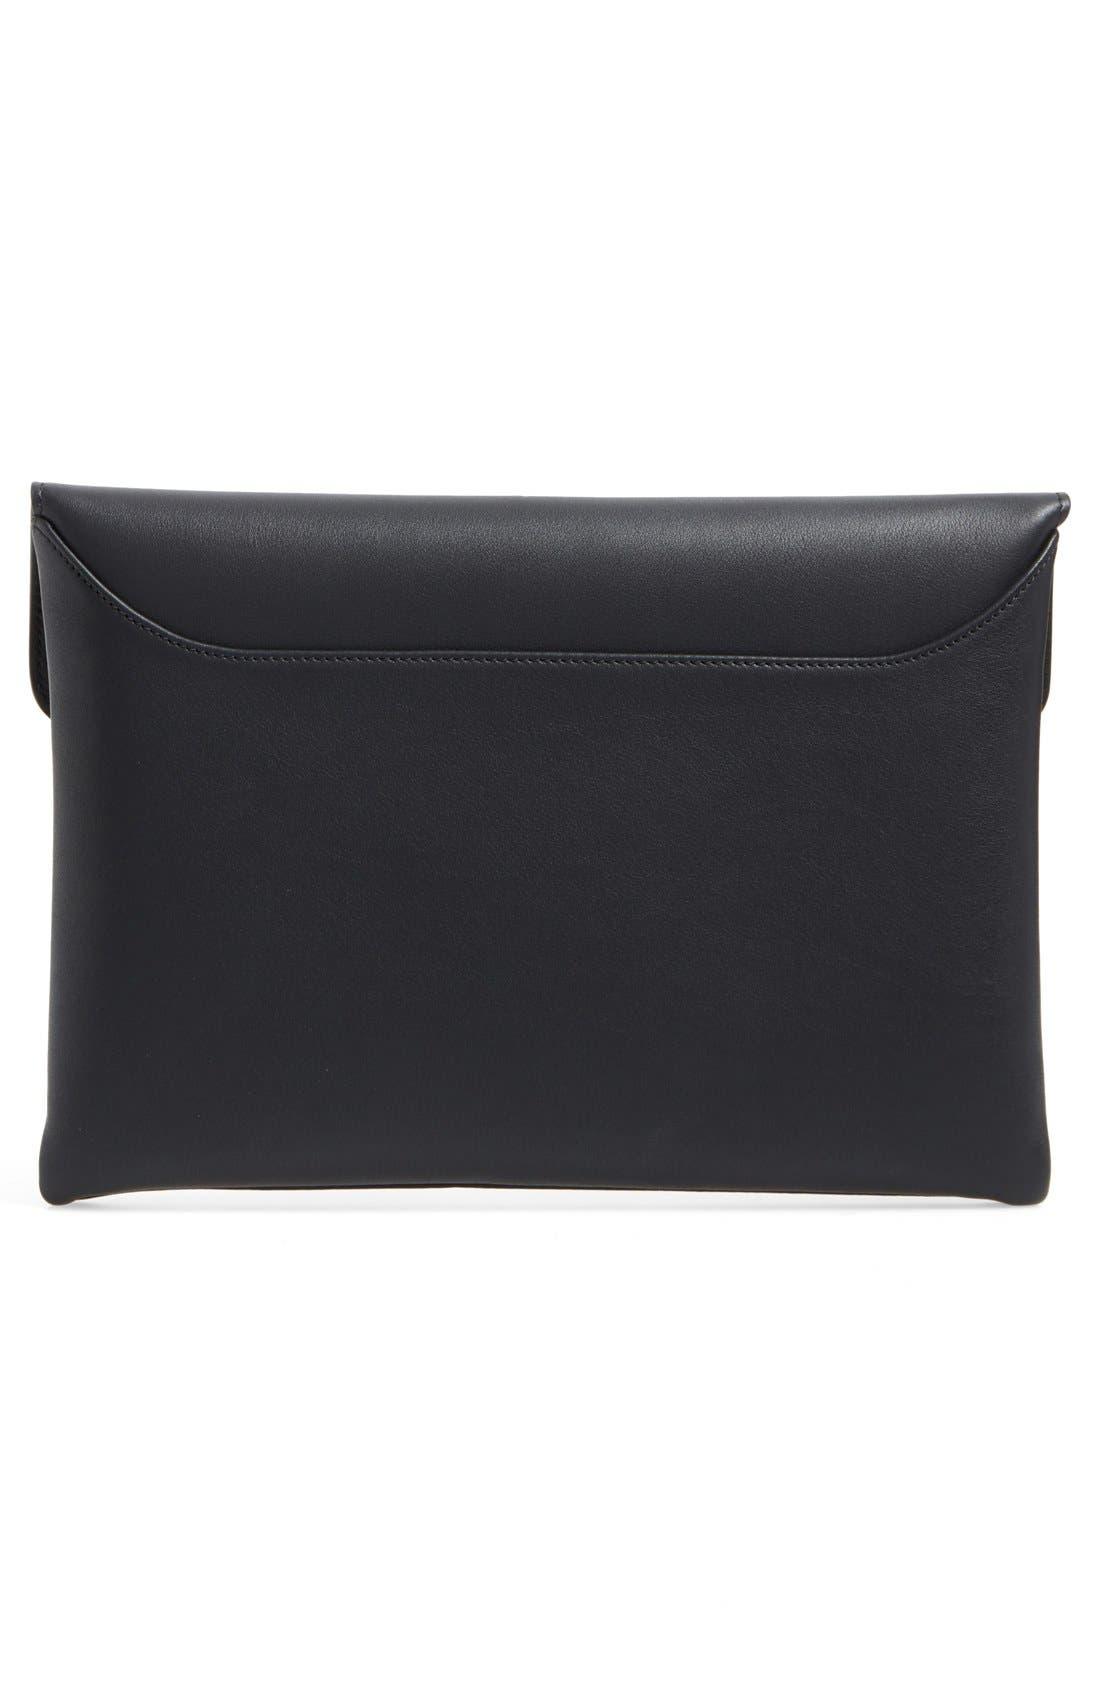 'Medium Antigona' Leather Envelope Clutch,                             Alternate thumbnail 2, color,                             Black